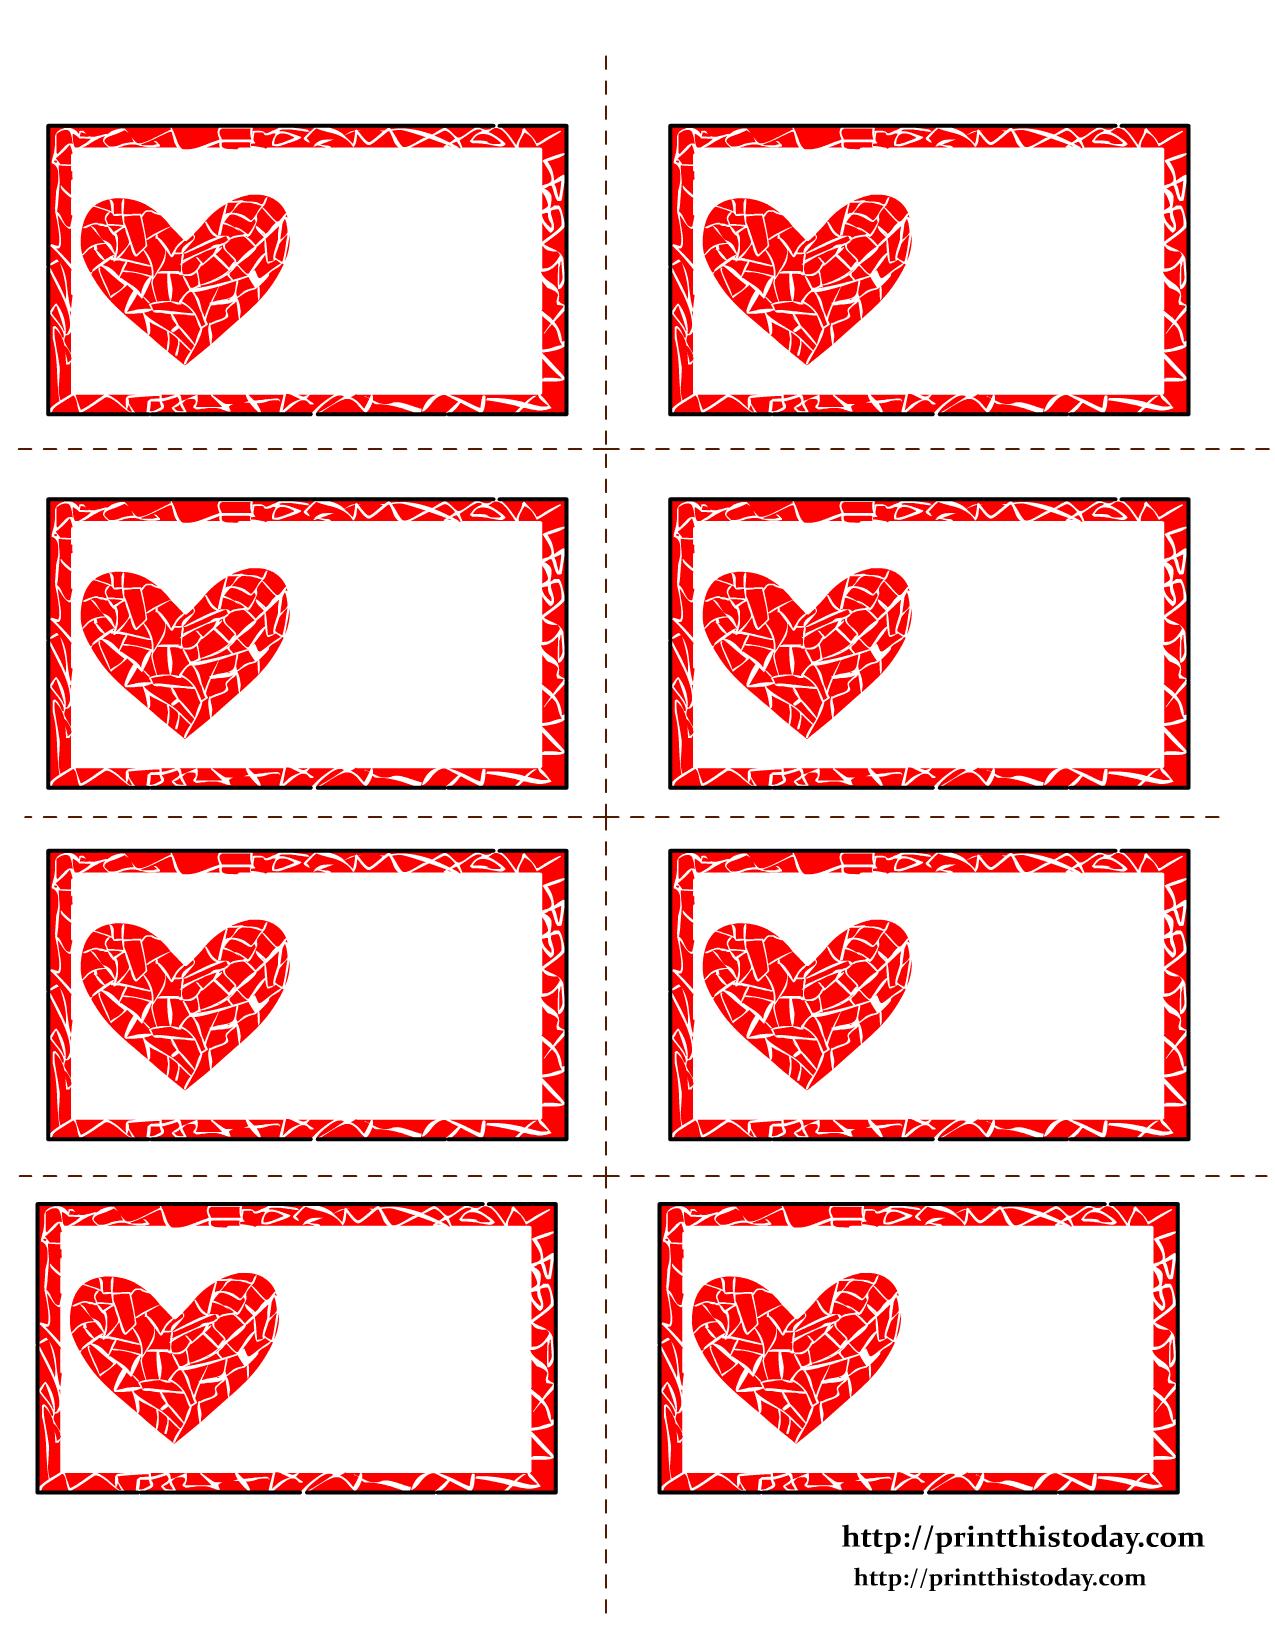 Free Printable Valentines Day Labelsann | Diyuradi Sam - Free Printable Heart Labels